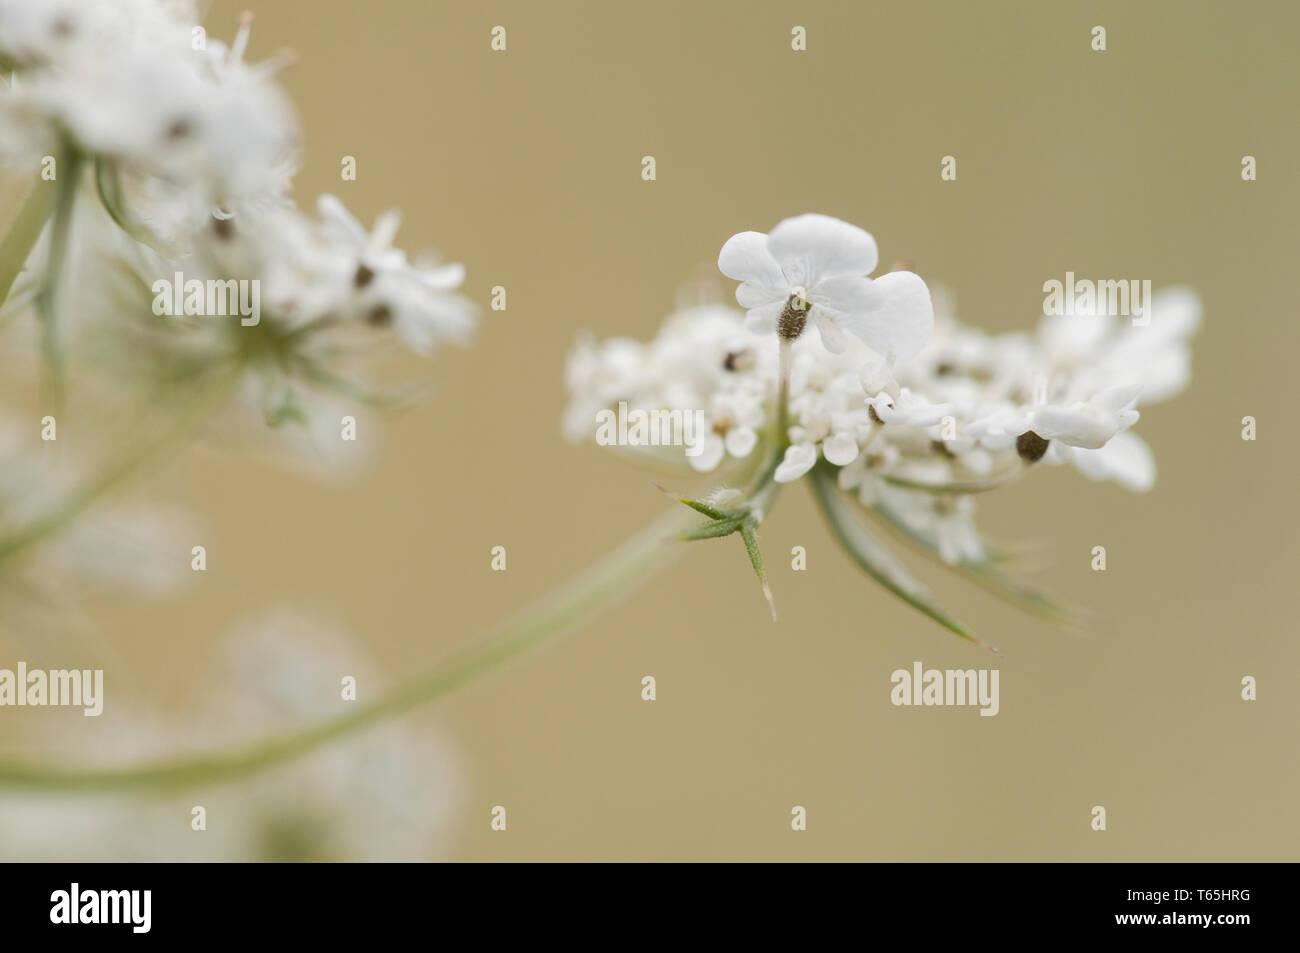 Wilde Möhre (Daucus carota Subsp carota), Deutsch Stockbild